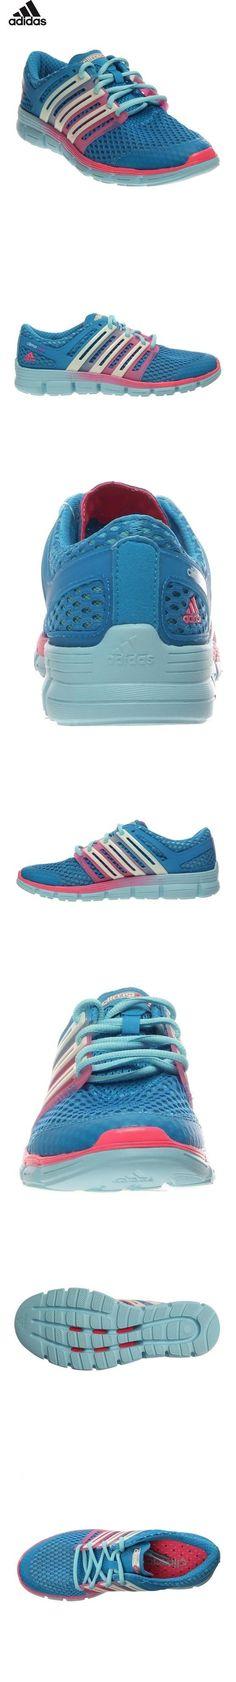 buy popular 7e27c 1c807 59.95 - New Adidas Womens ClimaCool Crazy Running Shoes Solar  BlueWhitePink 10